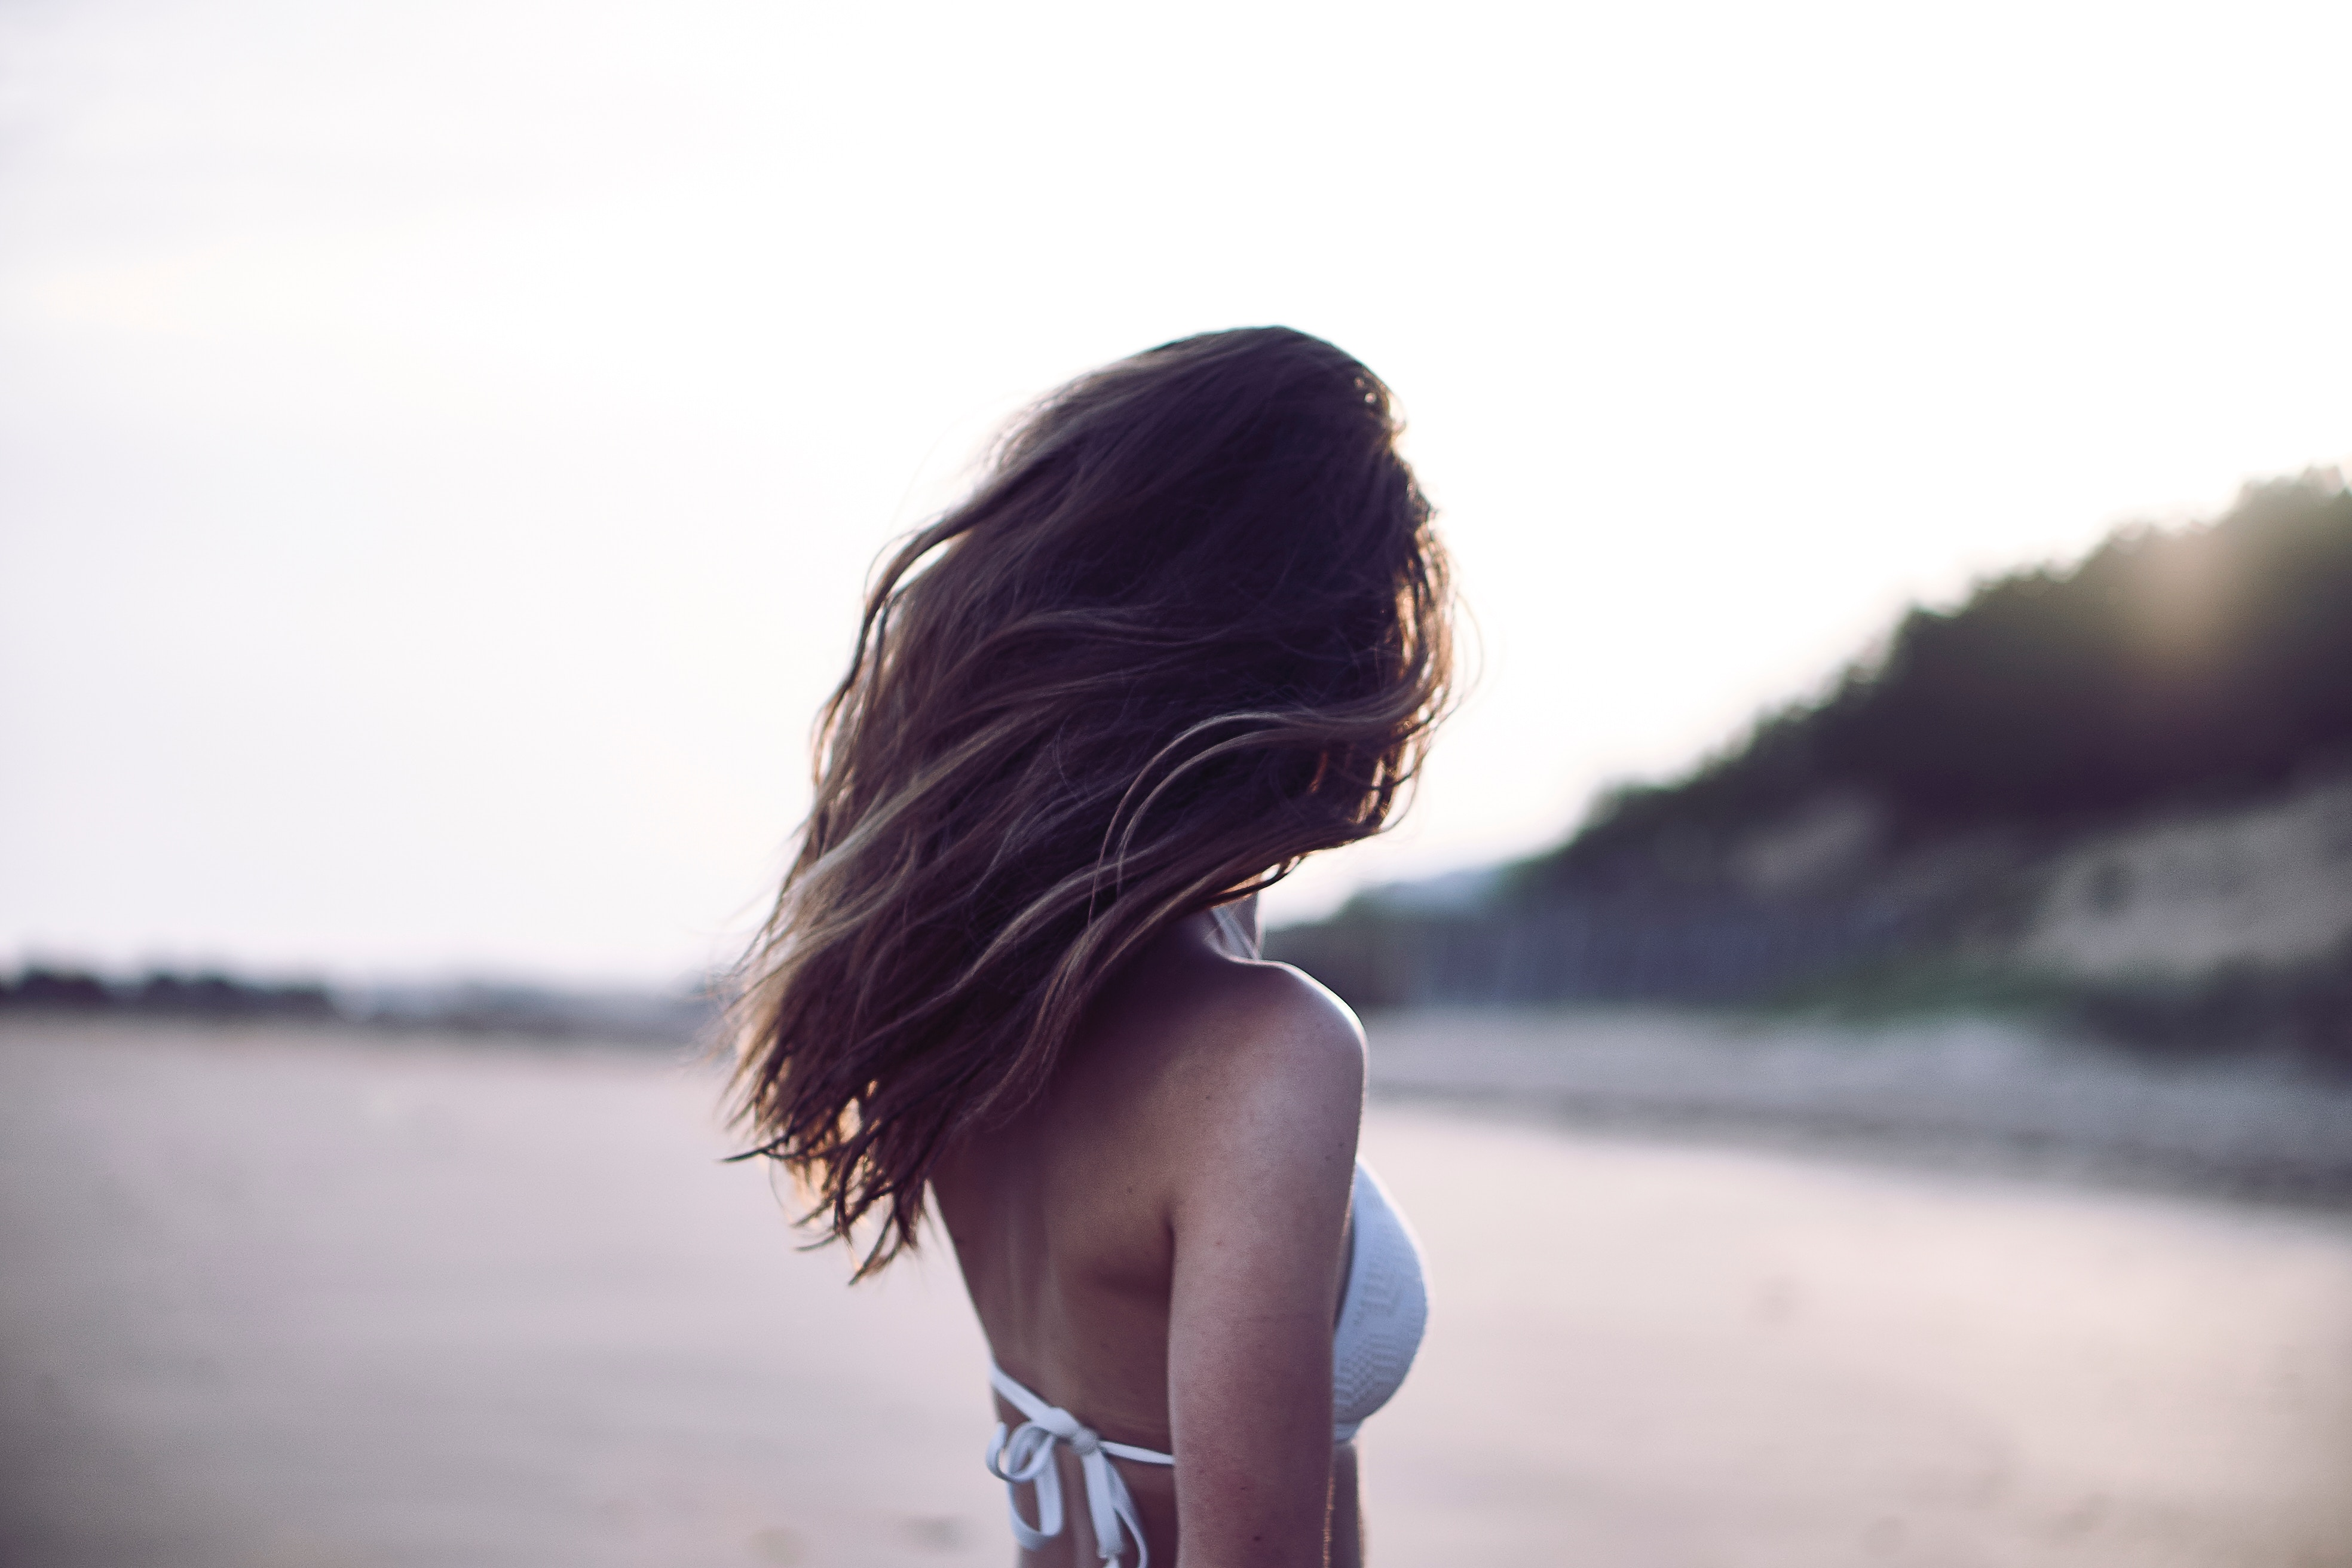 Nega kose tokom leta